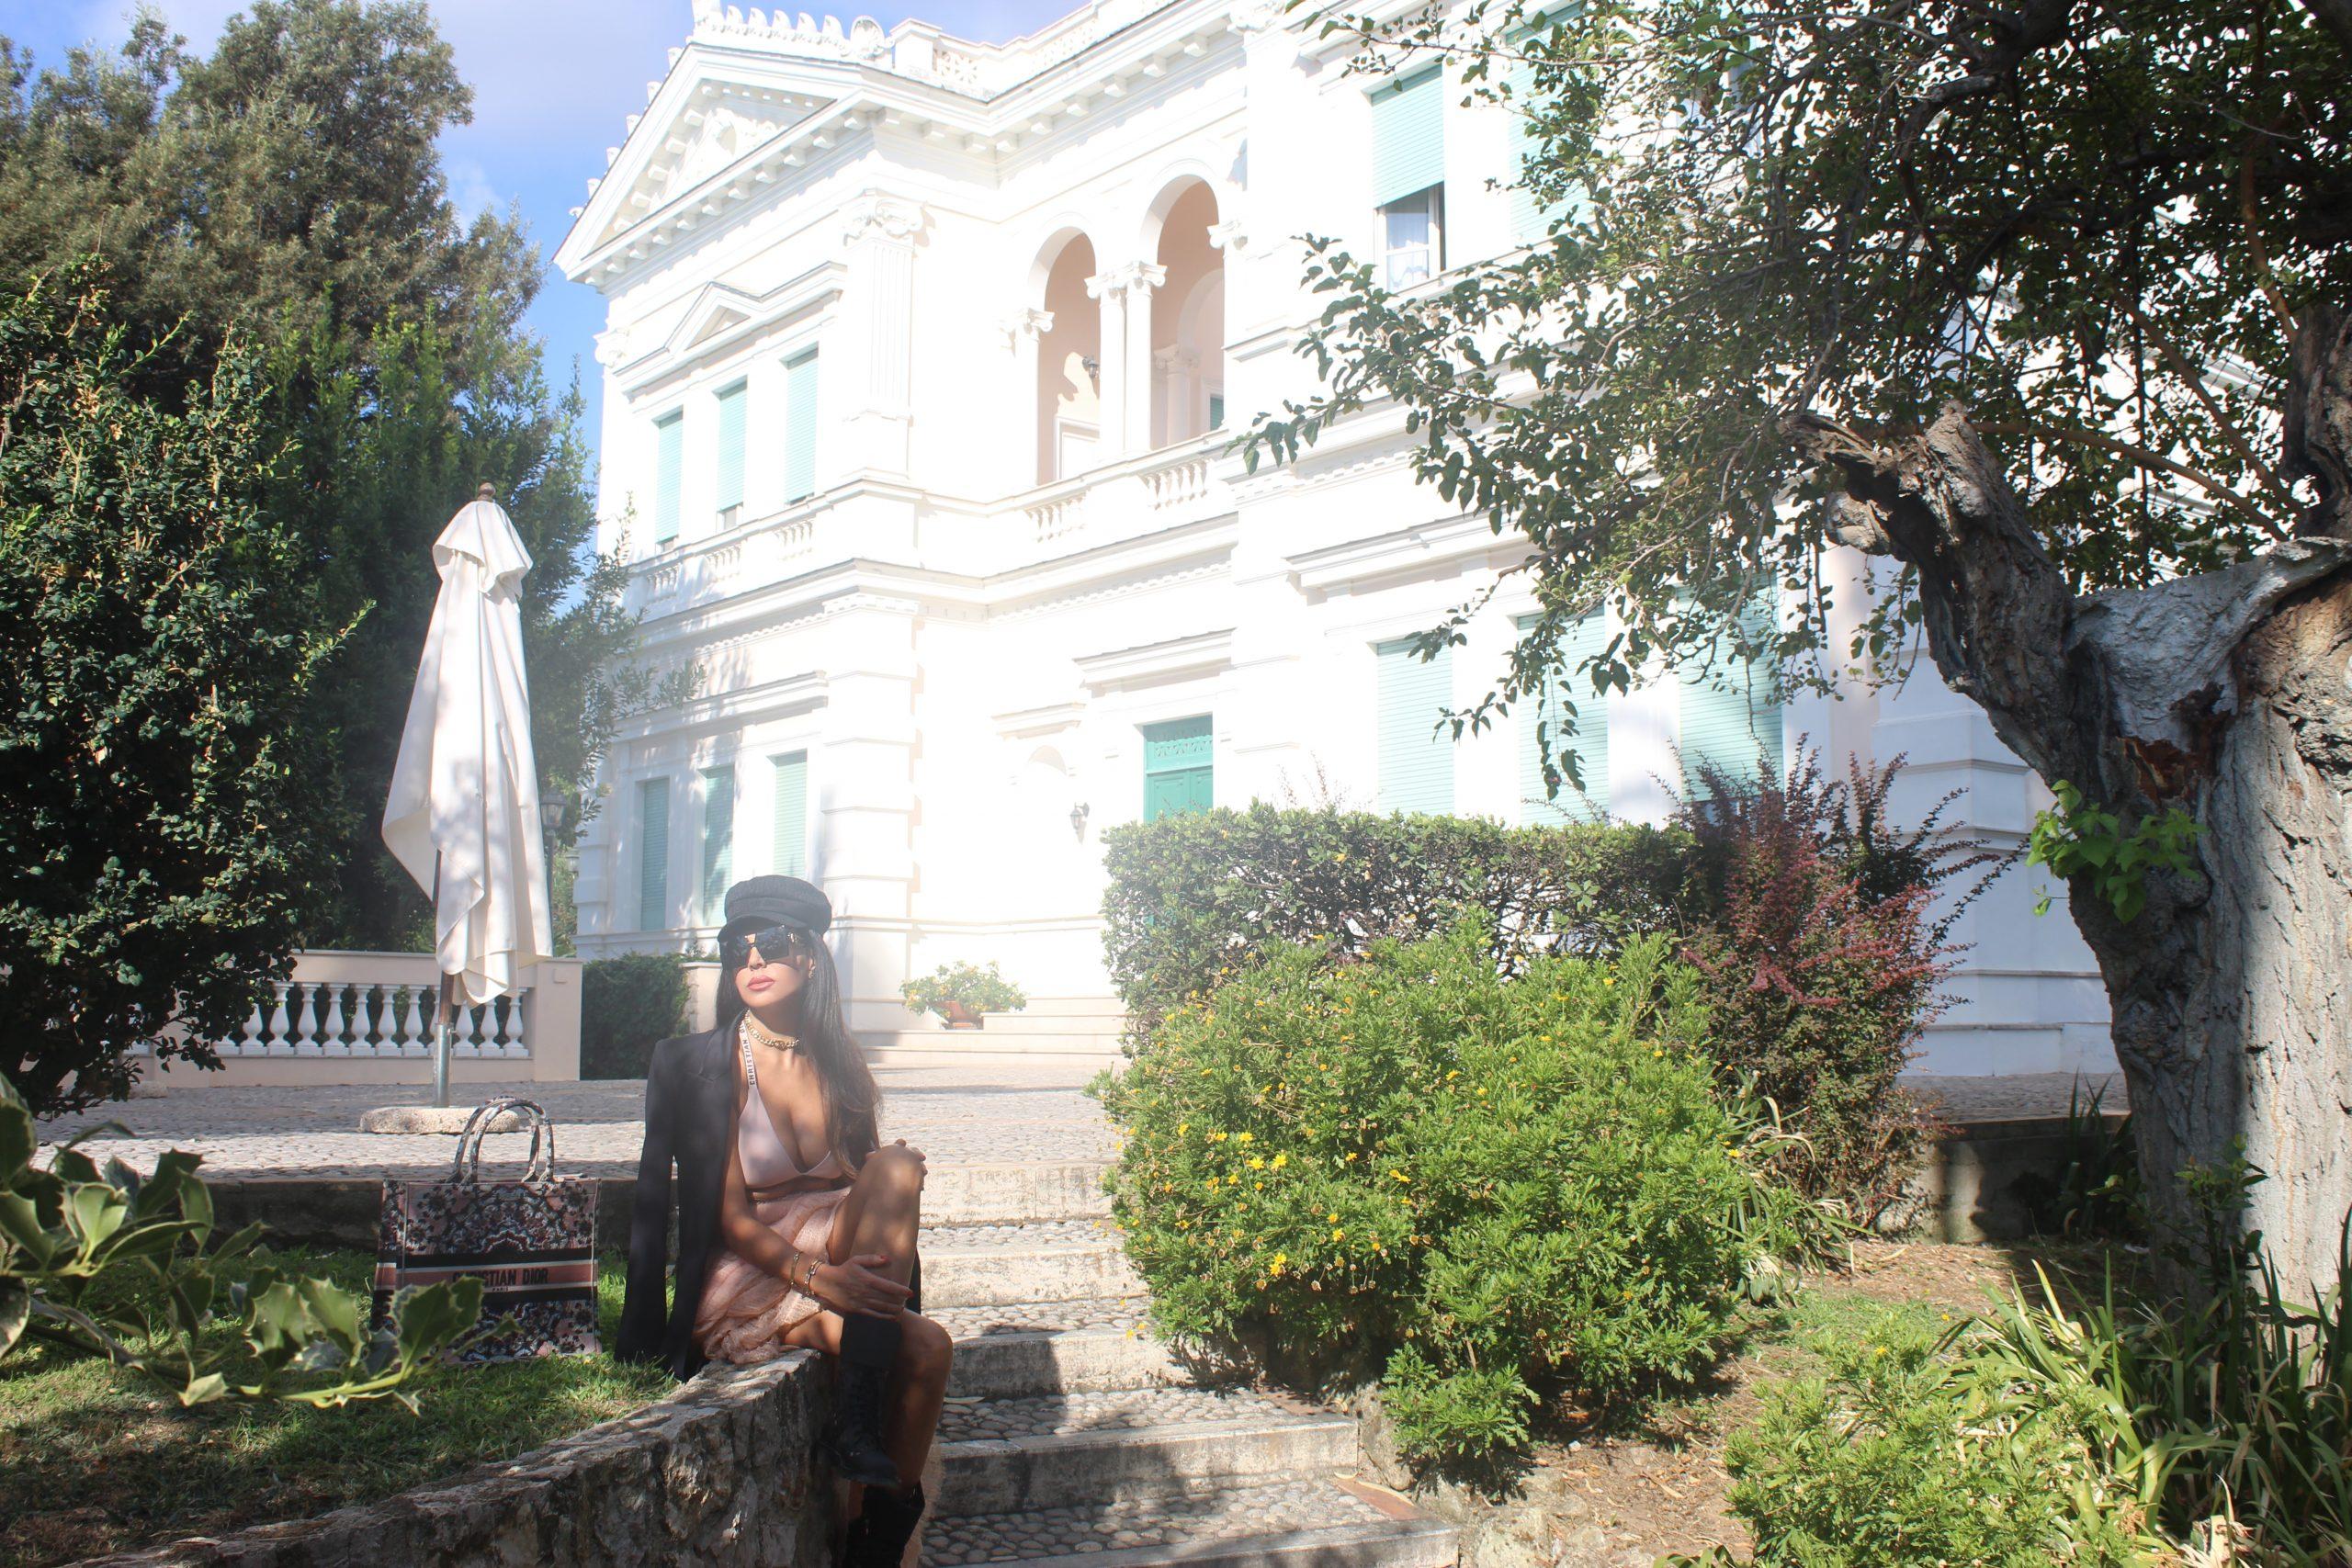 Italian summer staycation Gaeta Visit Italy Travelblog Travelblogger SIMONA CORSELLINI blazer  CRISTINAEFFE skirt DIOR set accessories Paola Lauretano